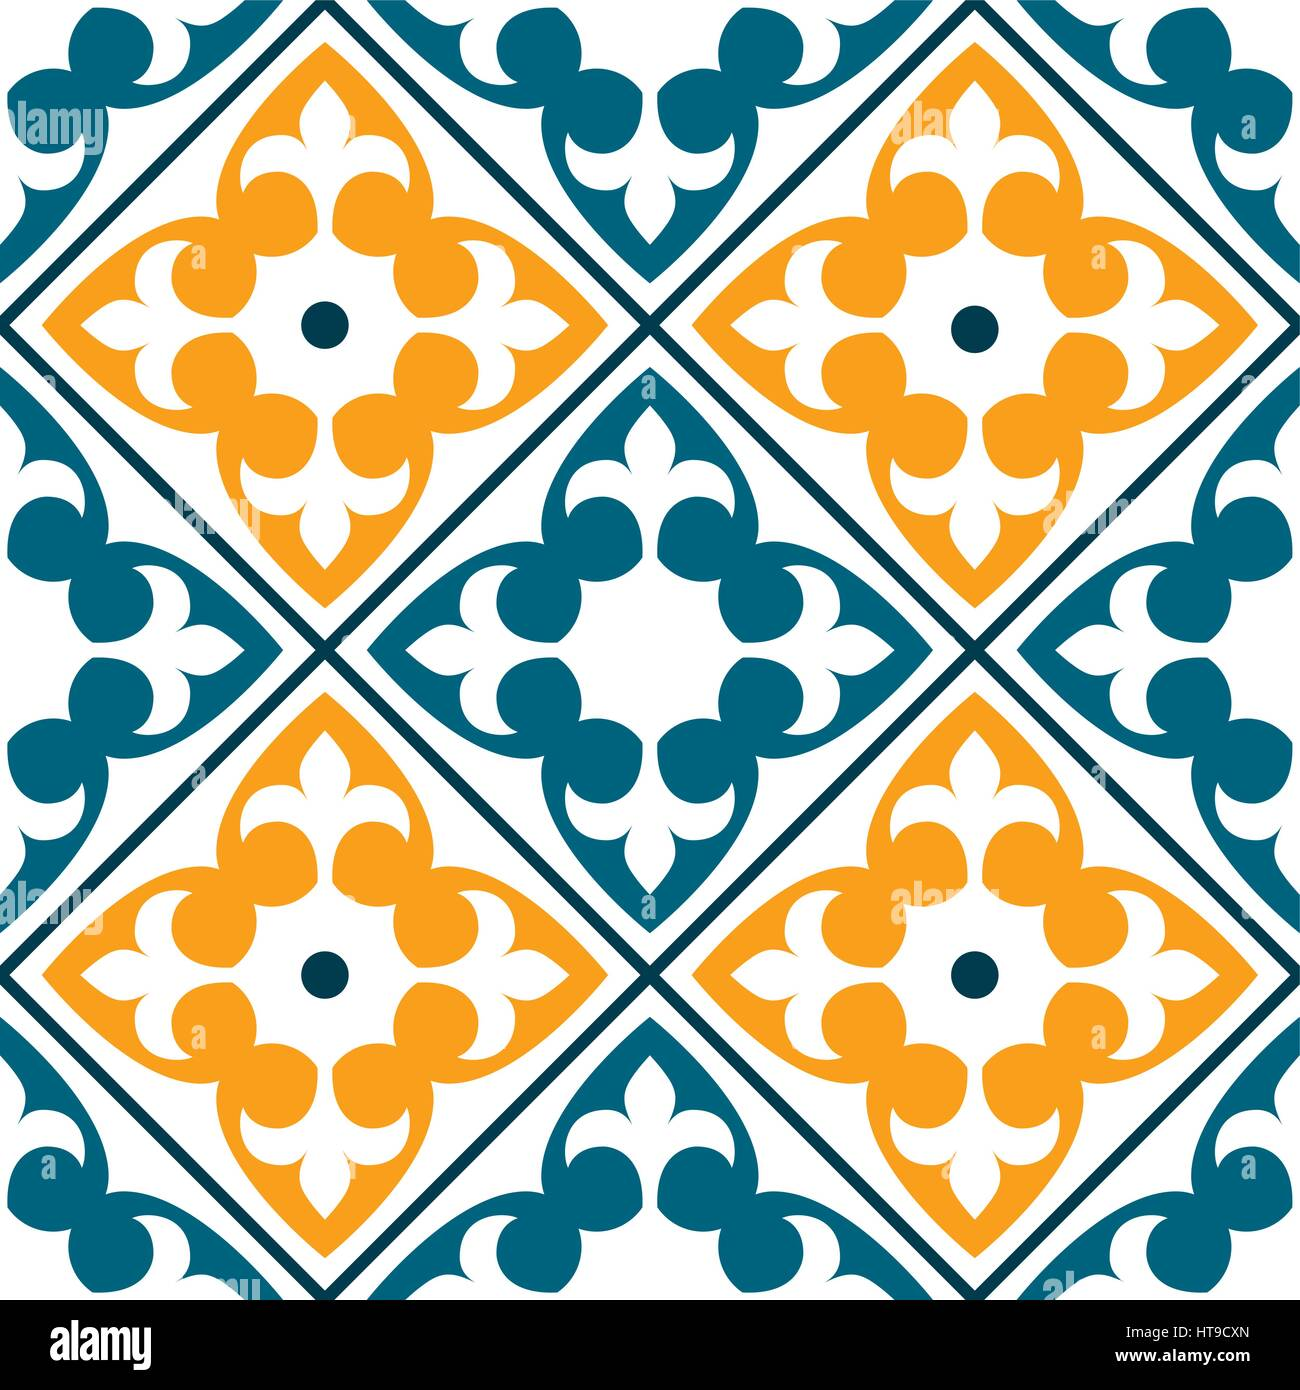 spanische fliese muster portugiesische oder marokkanische. Black Bedroom Furniture Sets. Home Design Ideas